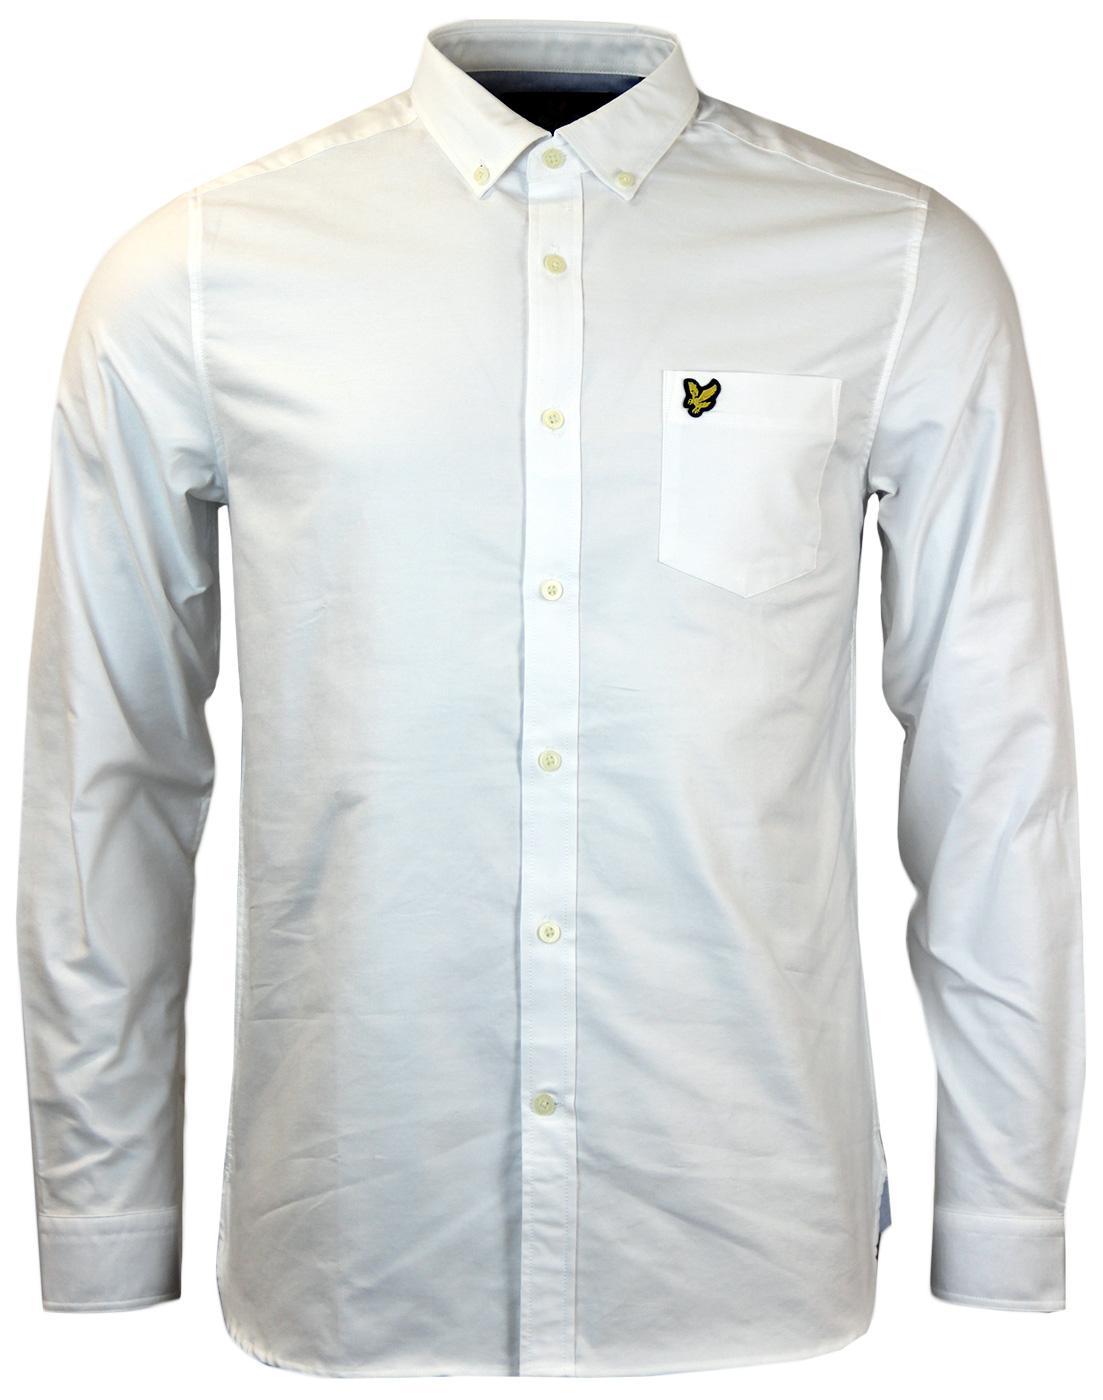 LYLE & SCOTT Retro Mod Button Down Oxford Shirt